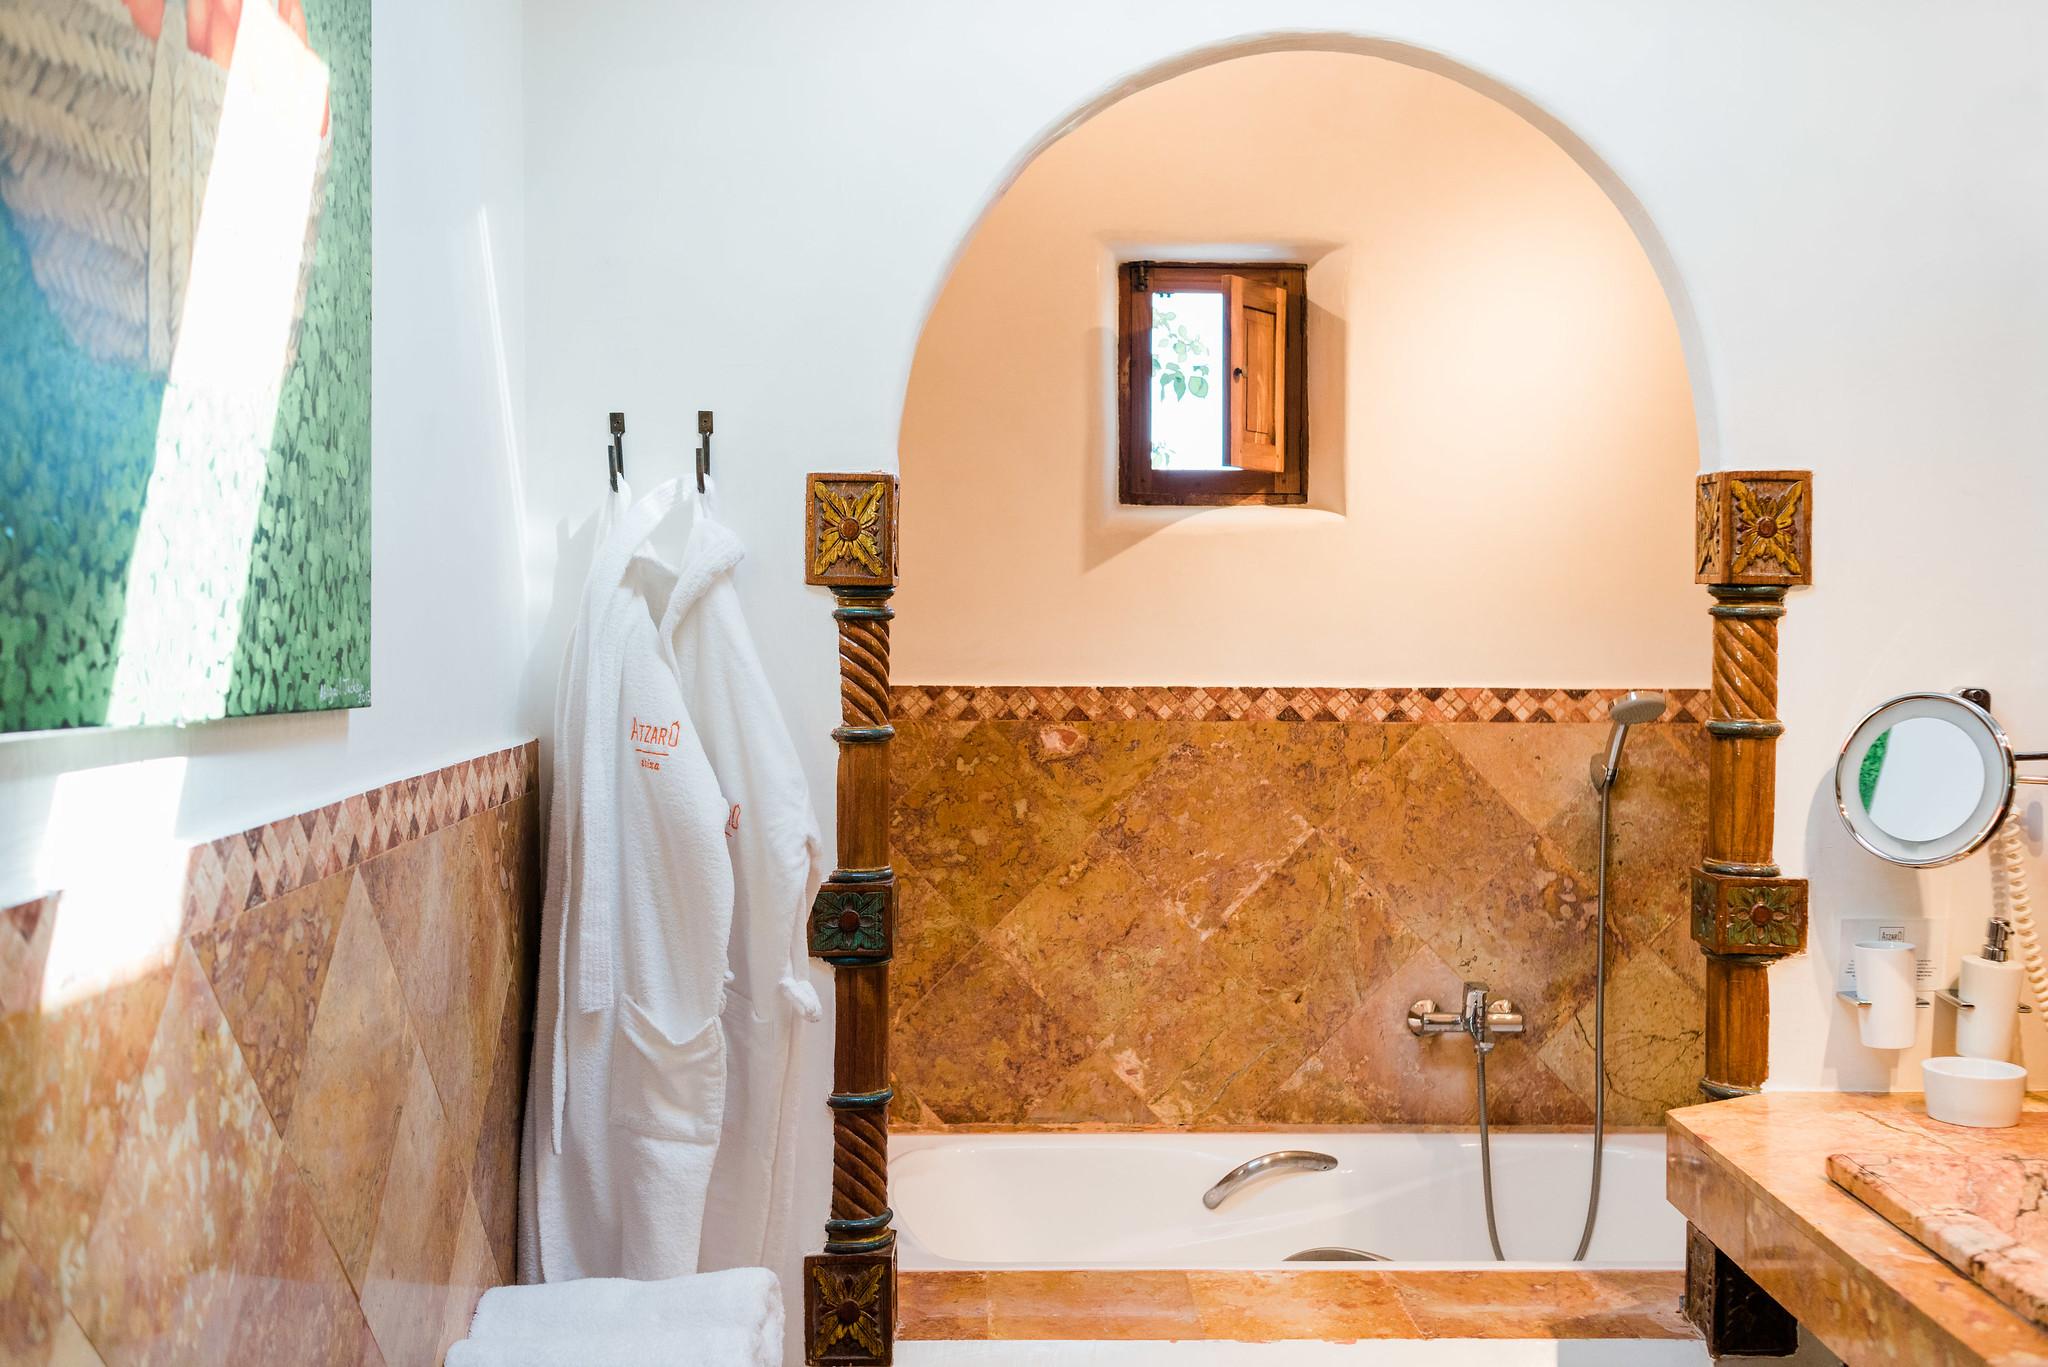 https://www.white-ibiza.com/wp-content/uploads/2019/11/ibiza-hotels-agoturismos-agroturismo-atzaro-01.jpg